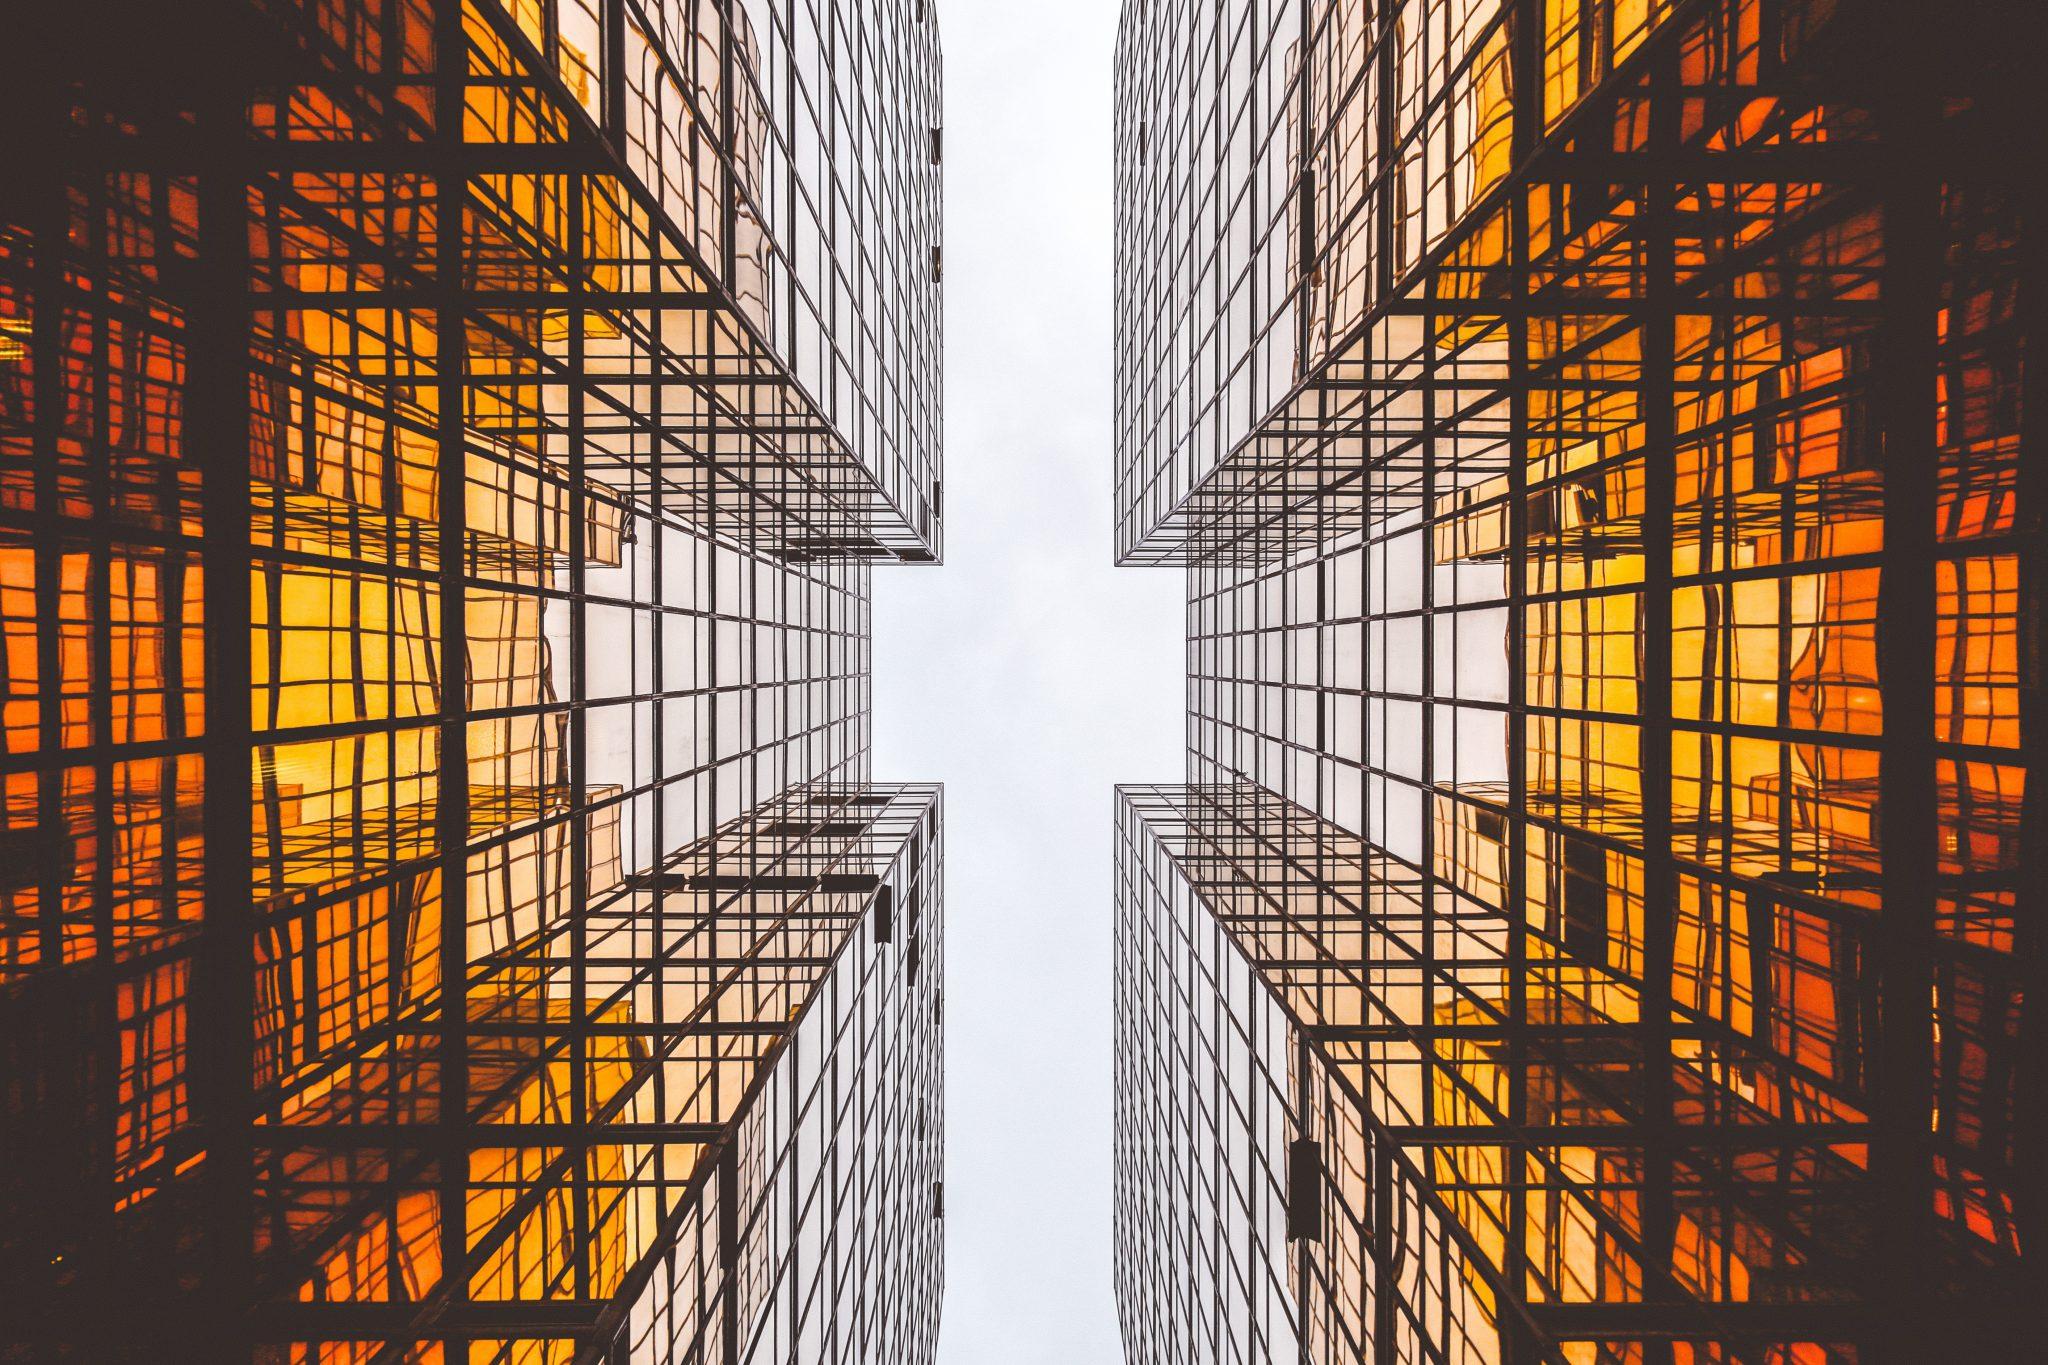 Skyscraper orange